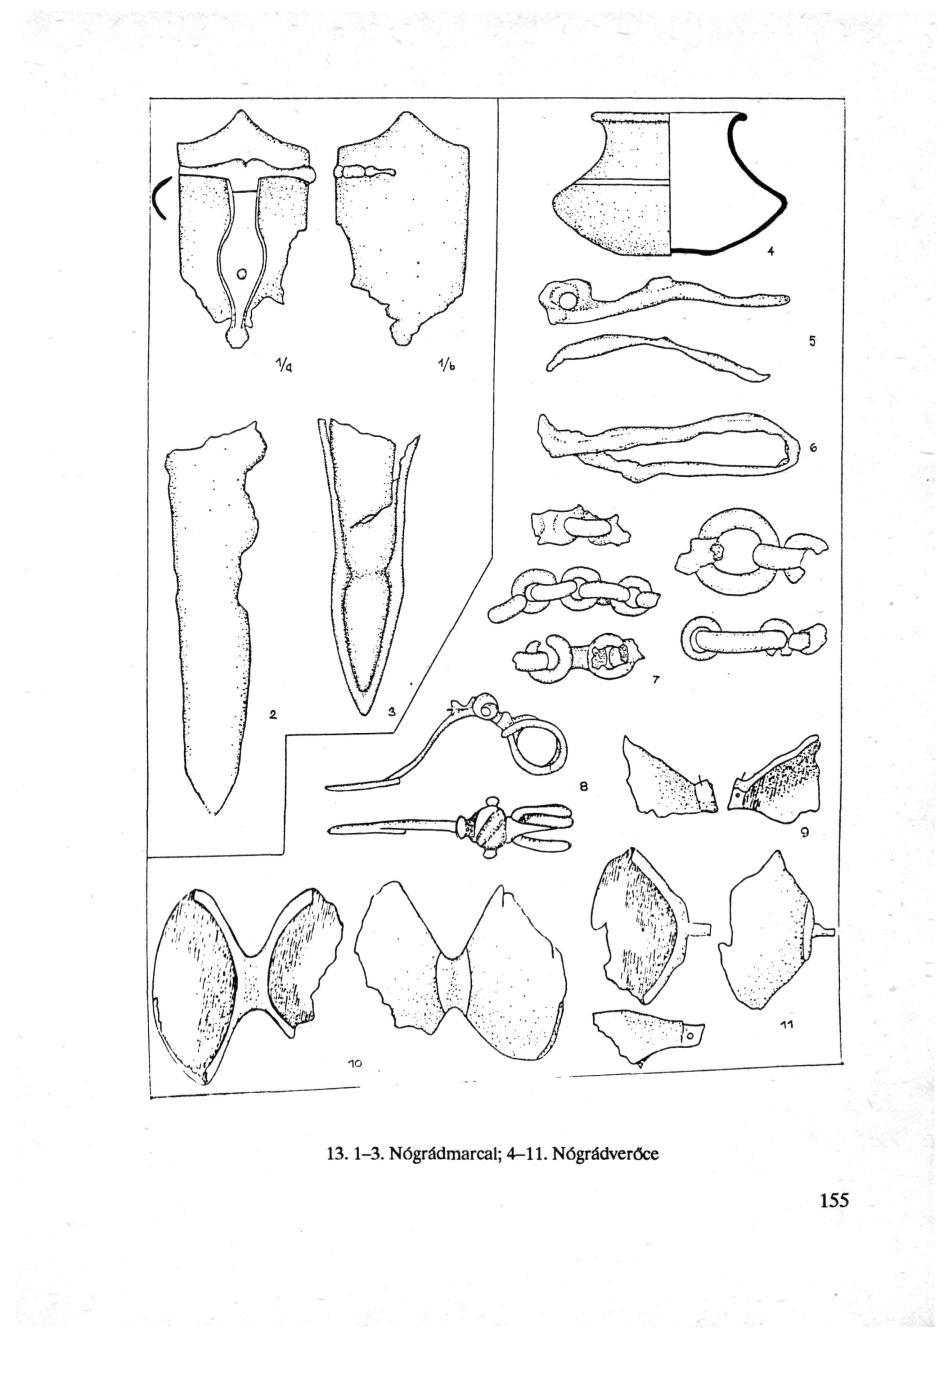 megy_nogr_muzevkonyv1991_pages157-157.jpg